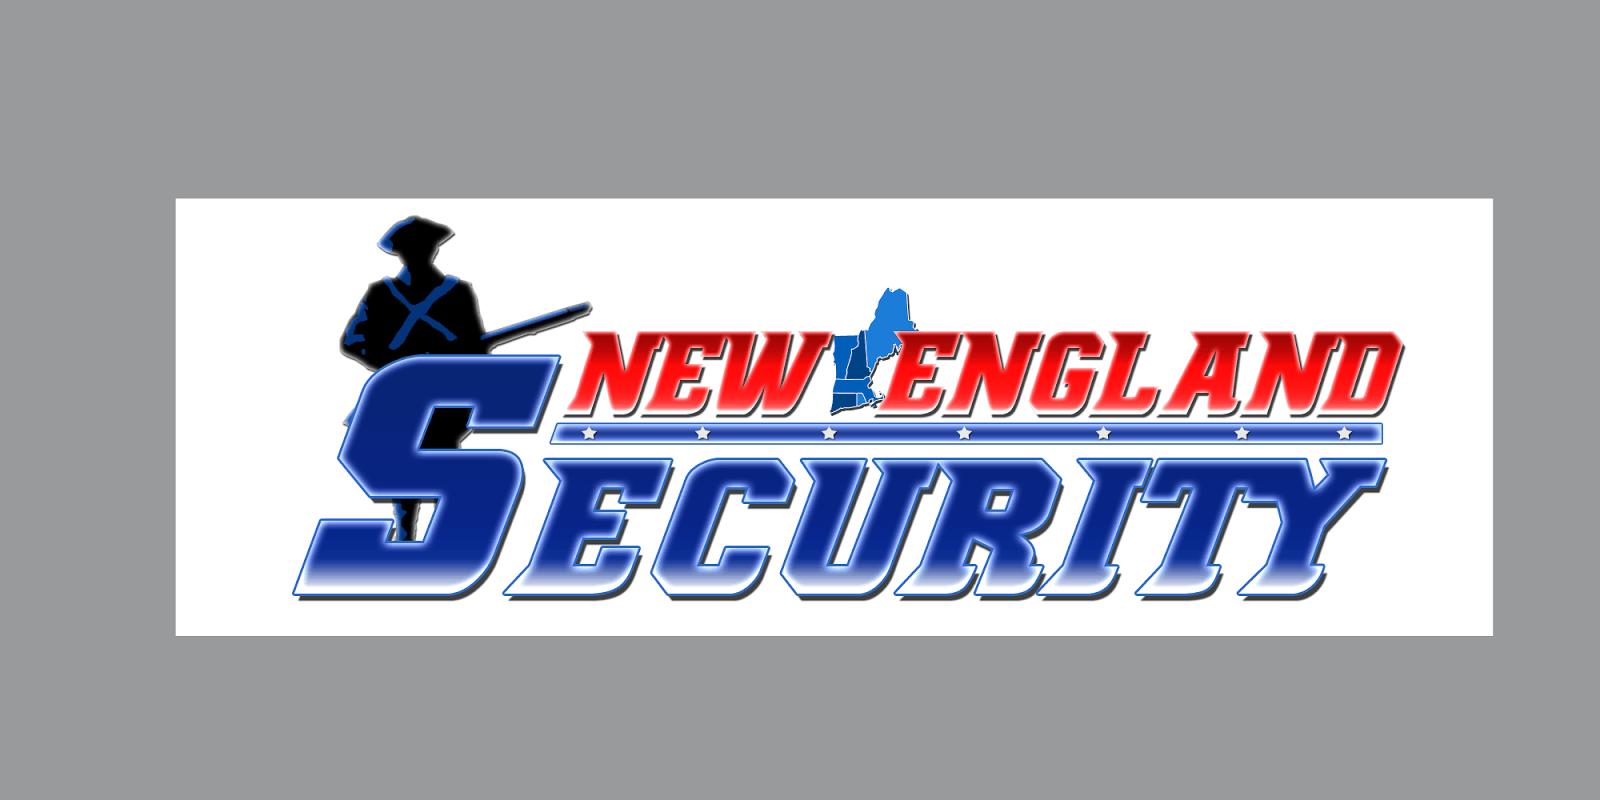 Security Guard Service Company Boston Massachusetts New